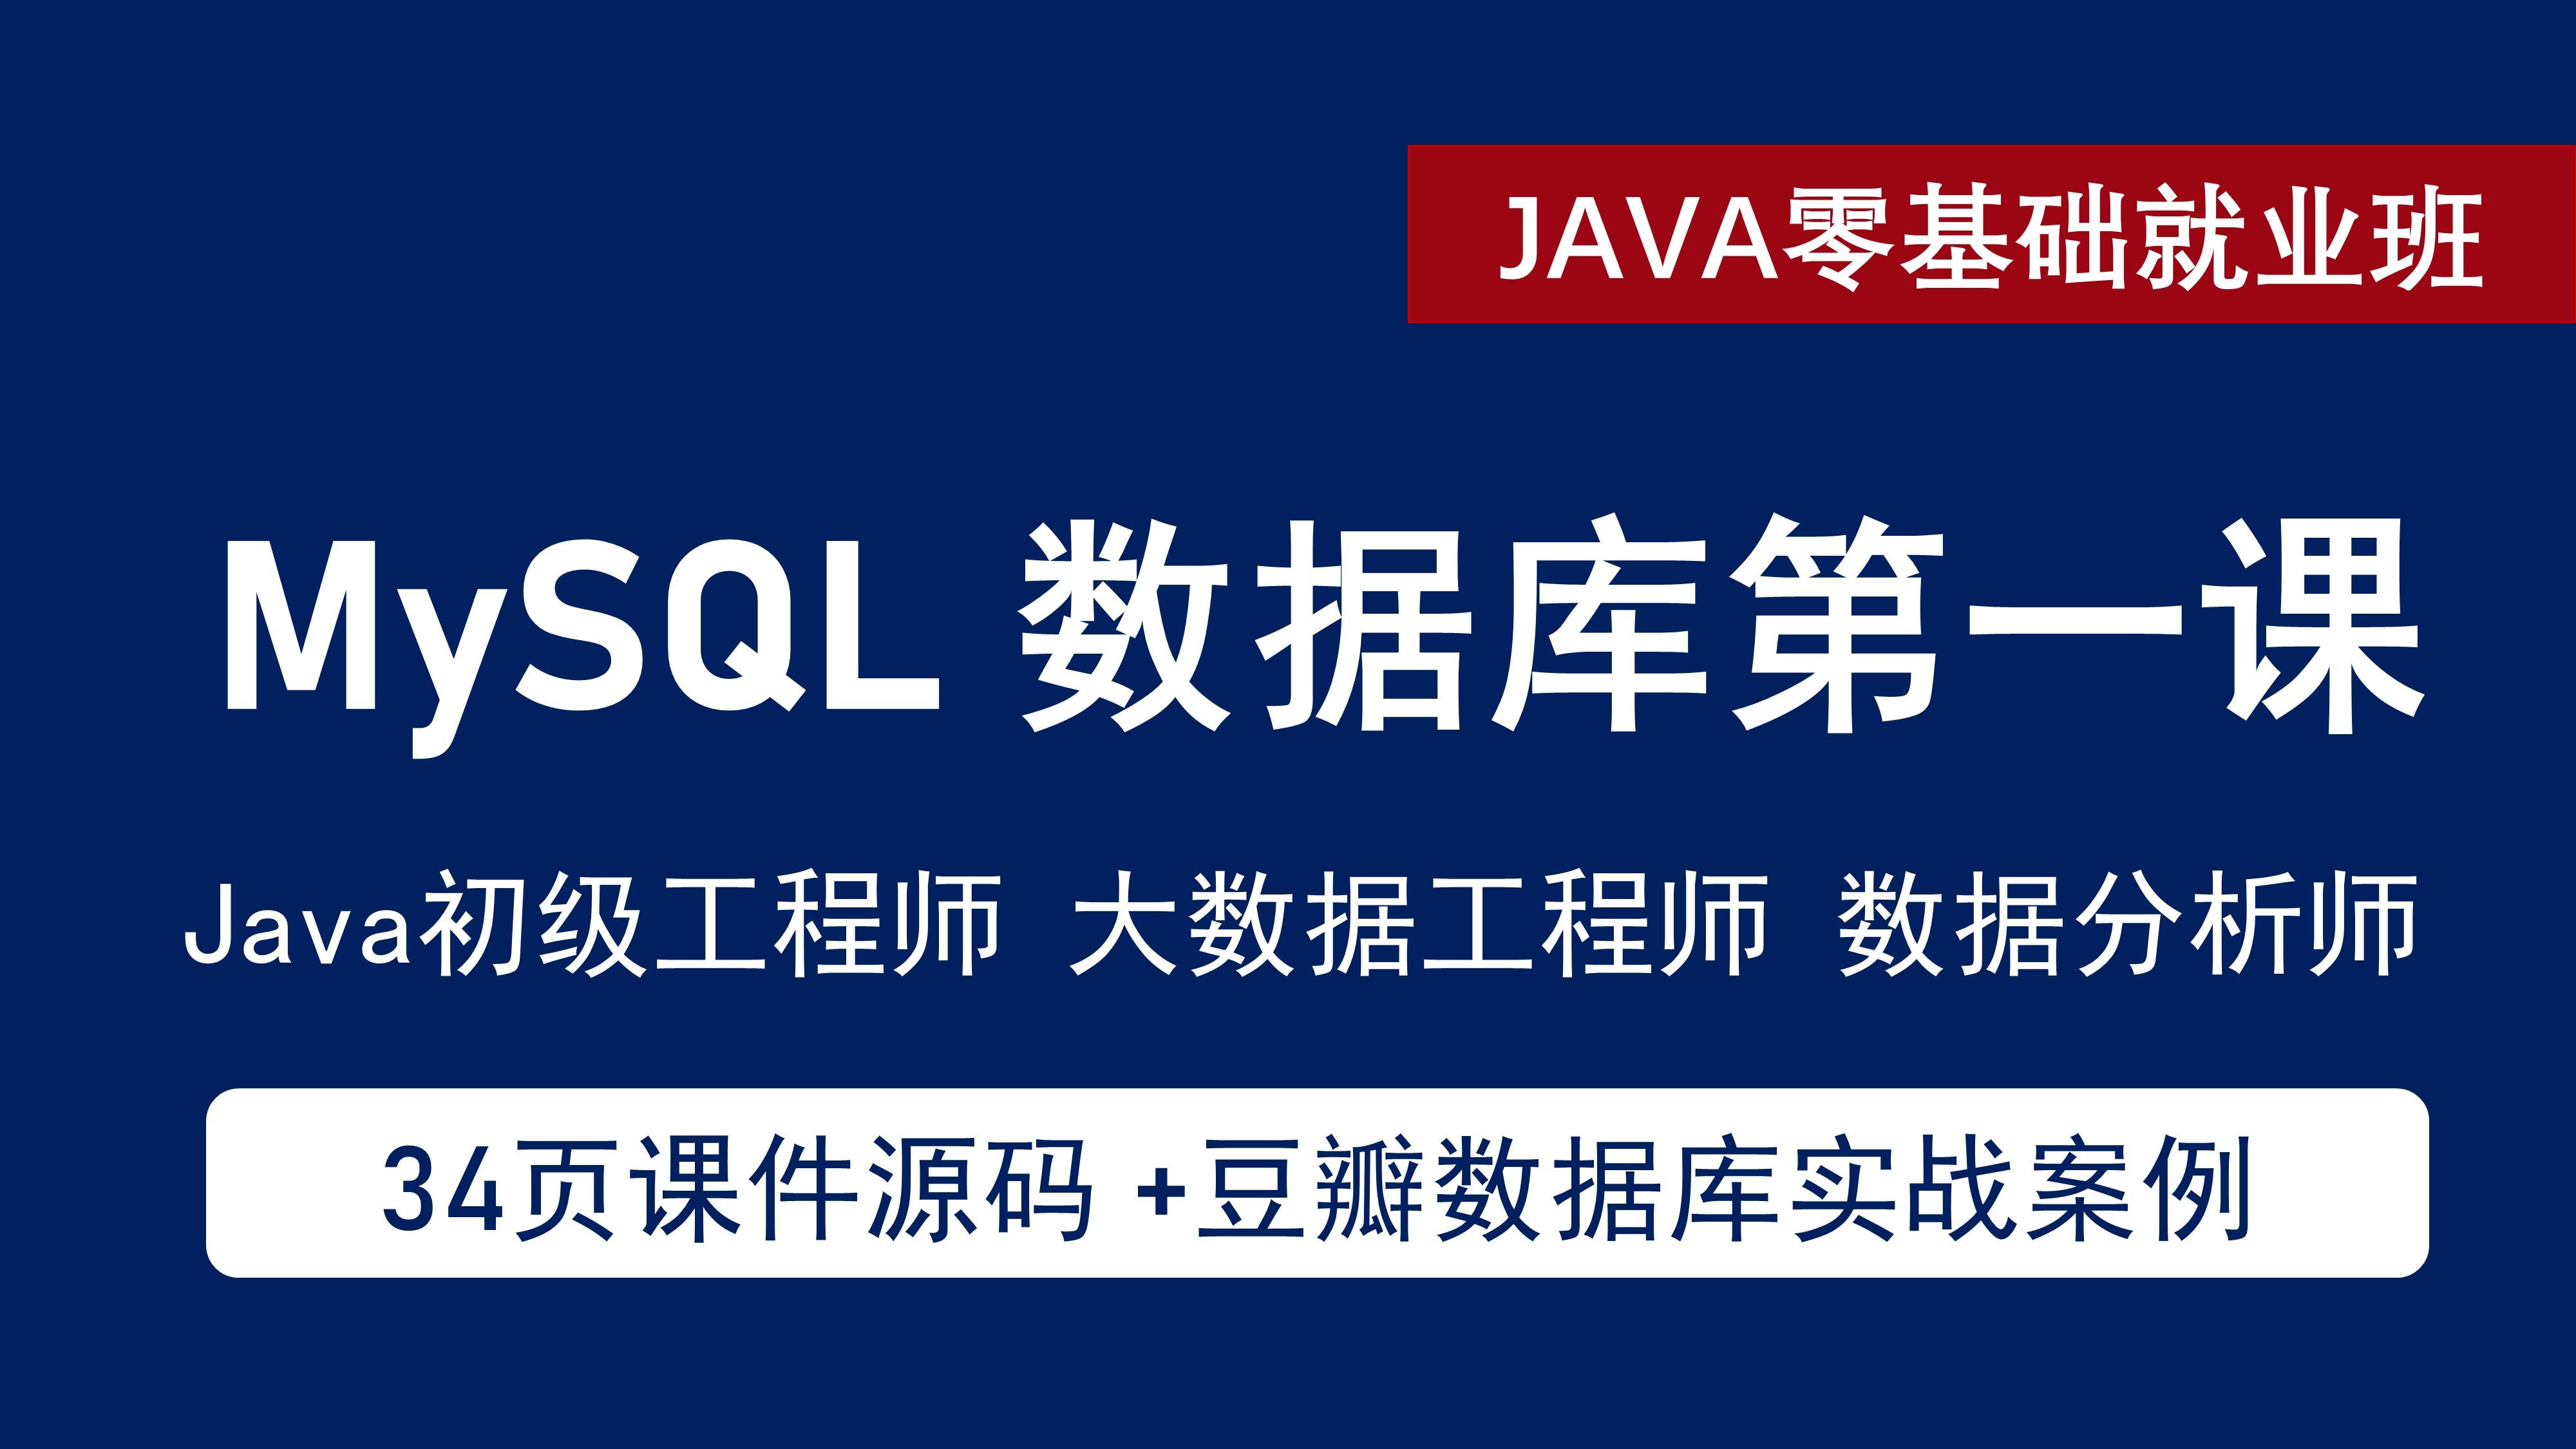 MySQL 数据库 / SQL数据分析教程